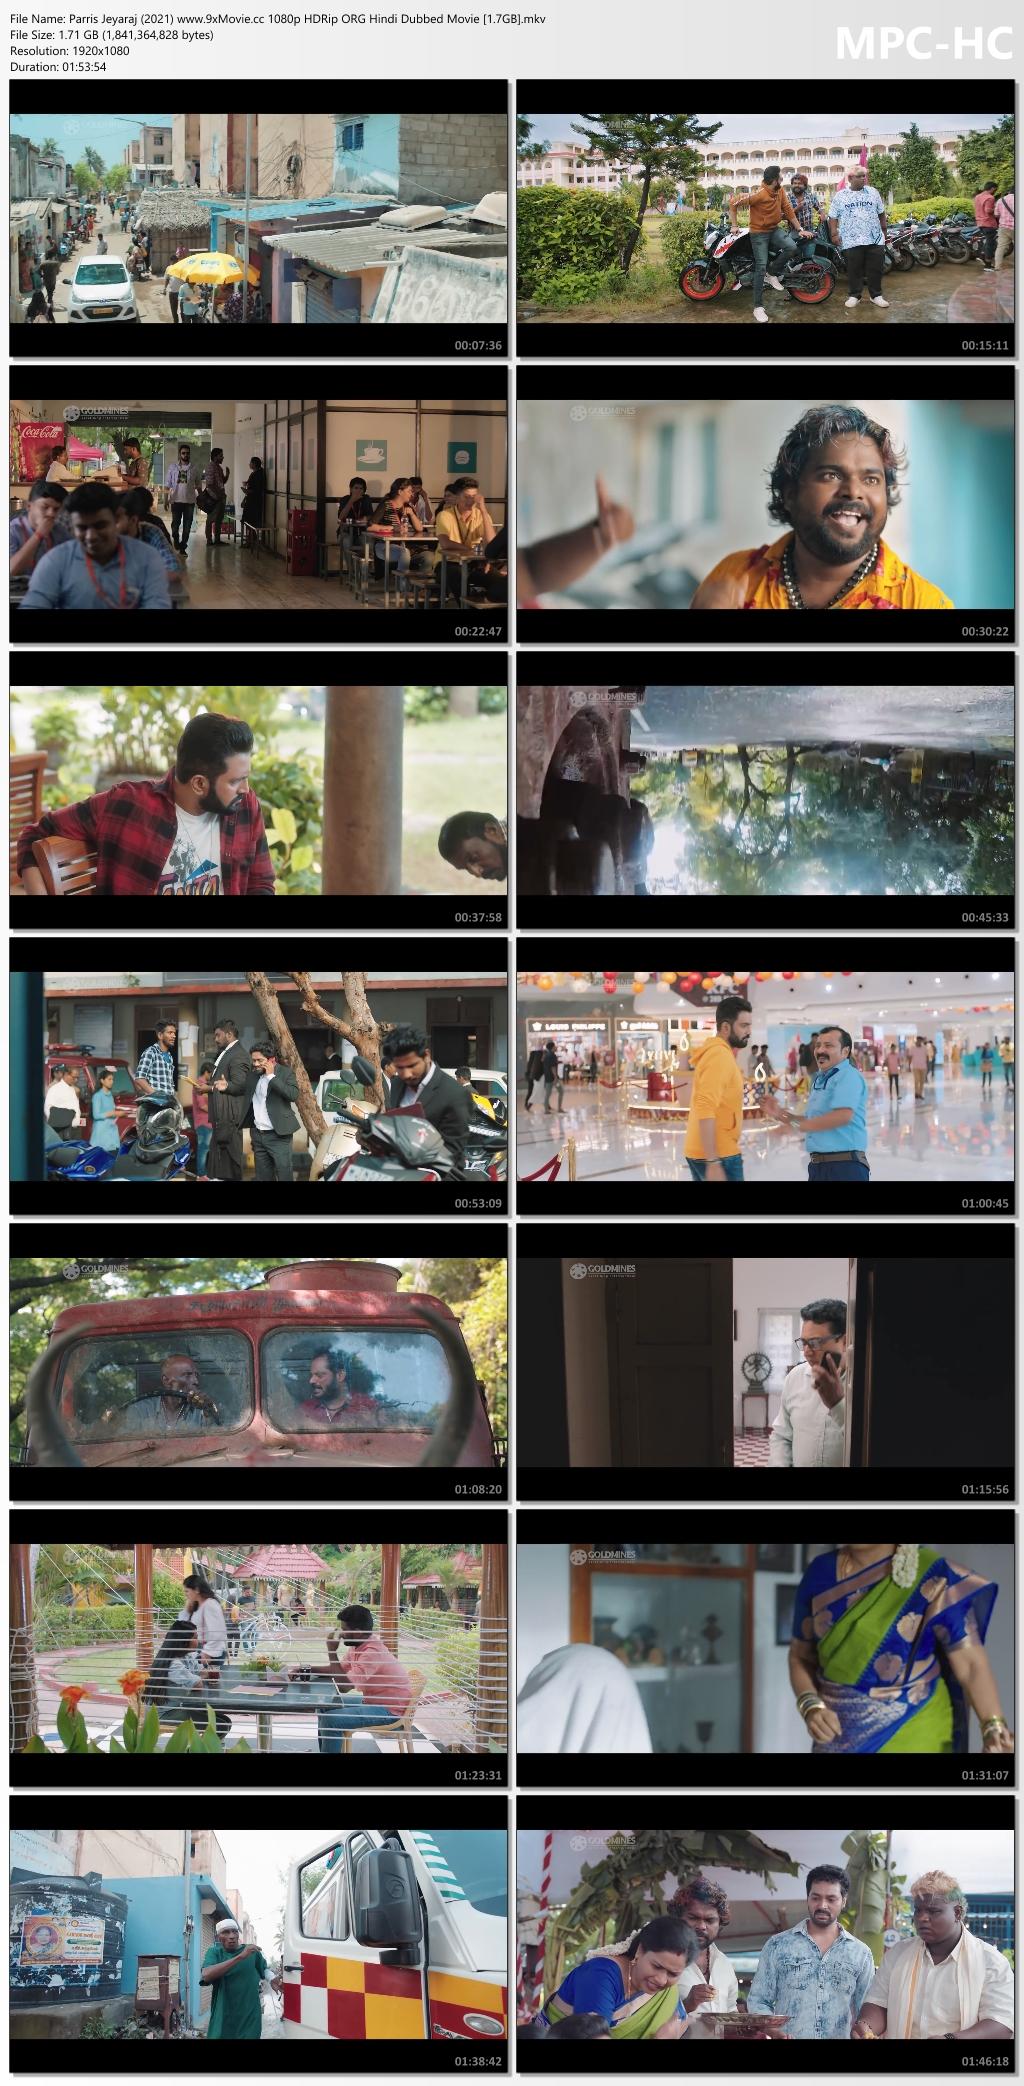 Parris-Jeyaraj-2021-www-9x-Movie-cc-1080p-HDRip-ORG-Hindi-Dubbed-Movie-1-7-GB-mkv